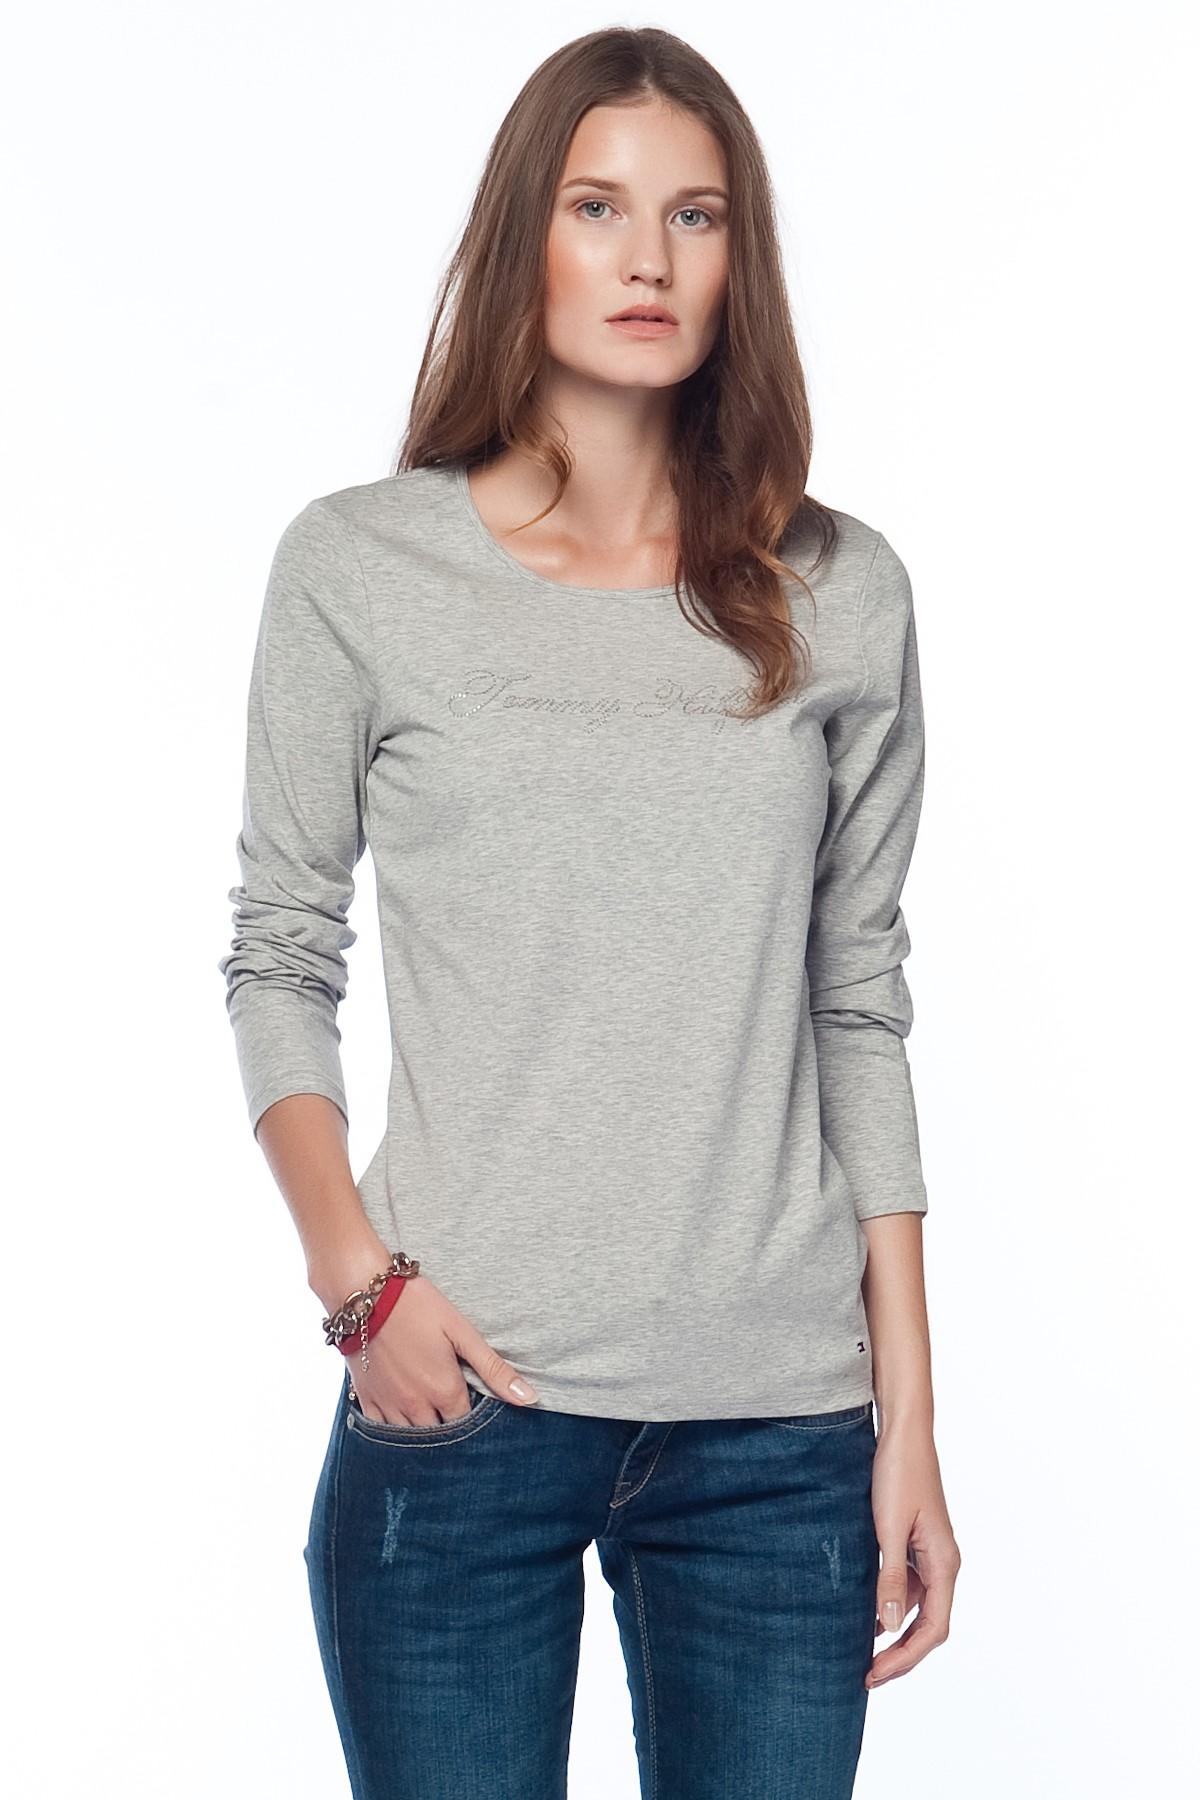 Tommy Hilfiger Gri Kadın Sweatshirt 1M87603734-002 1